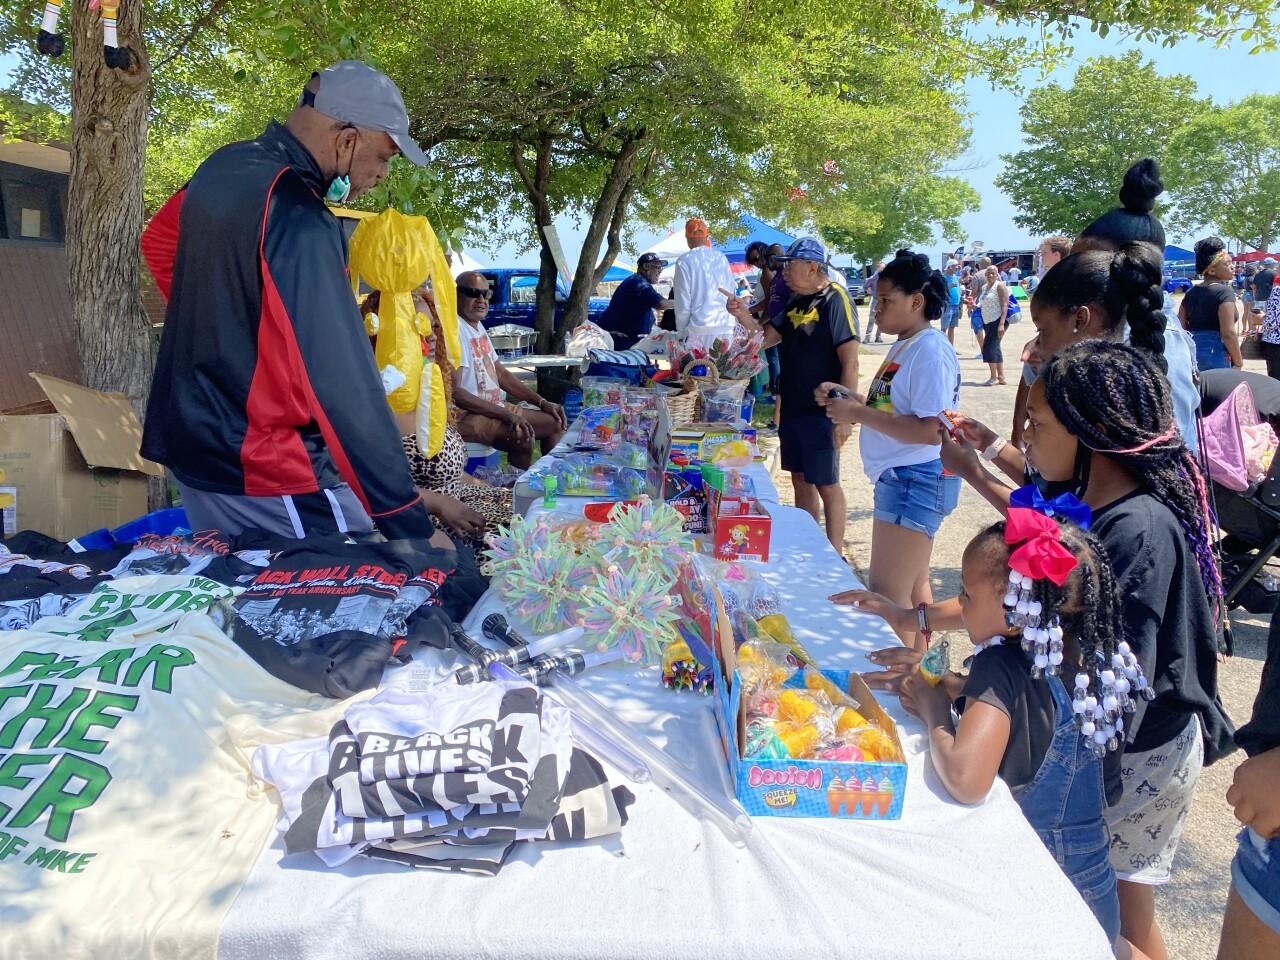 Racine Juneteenth celebration